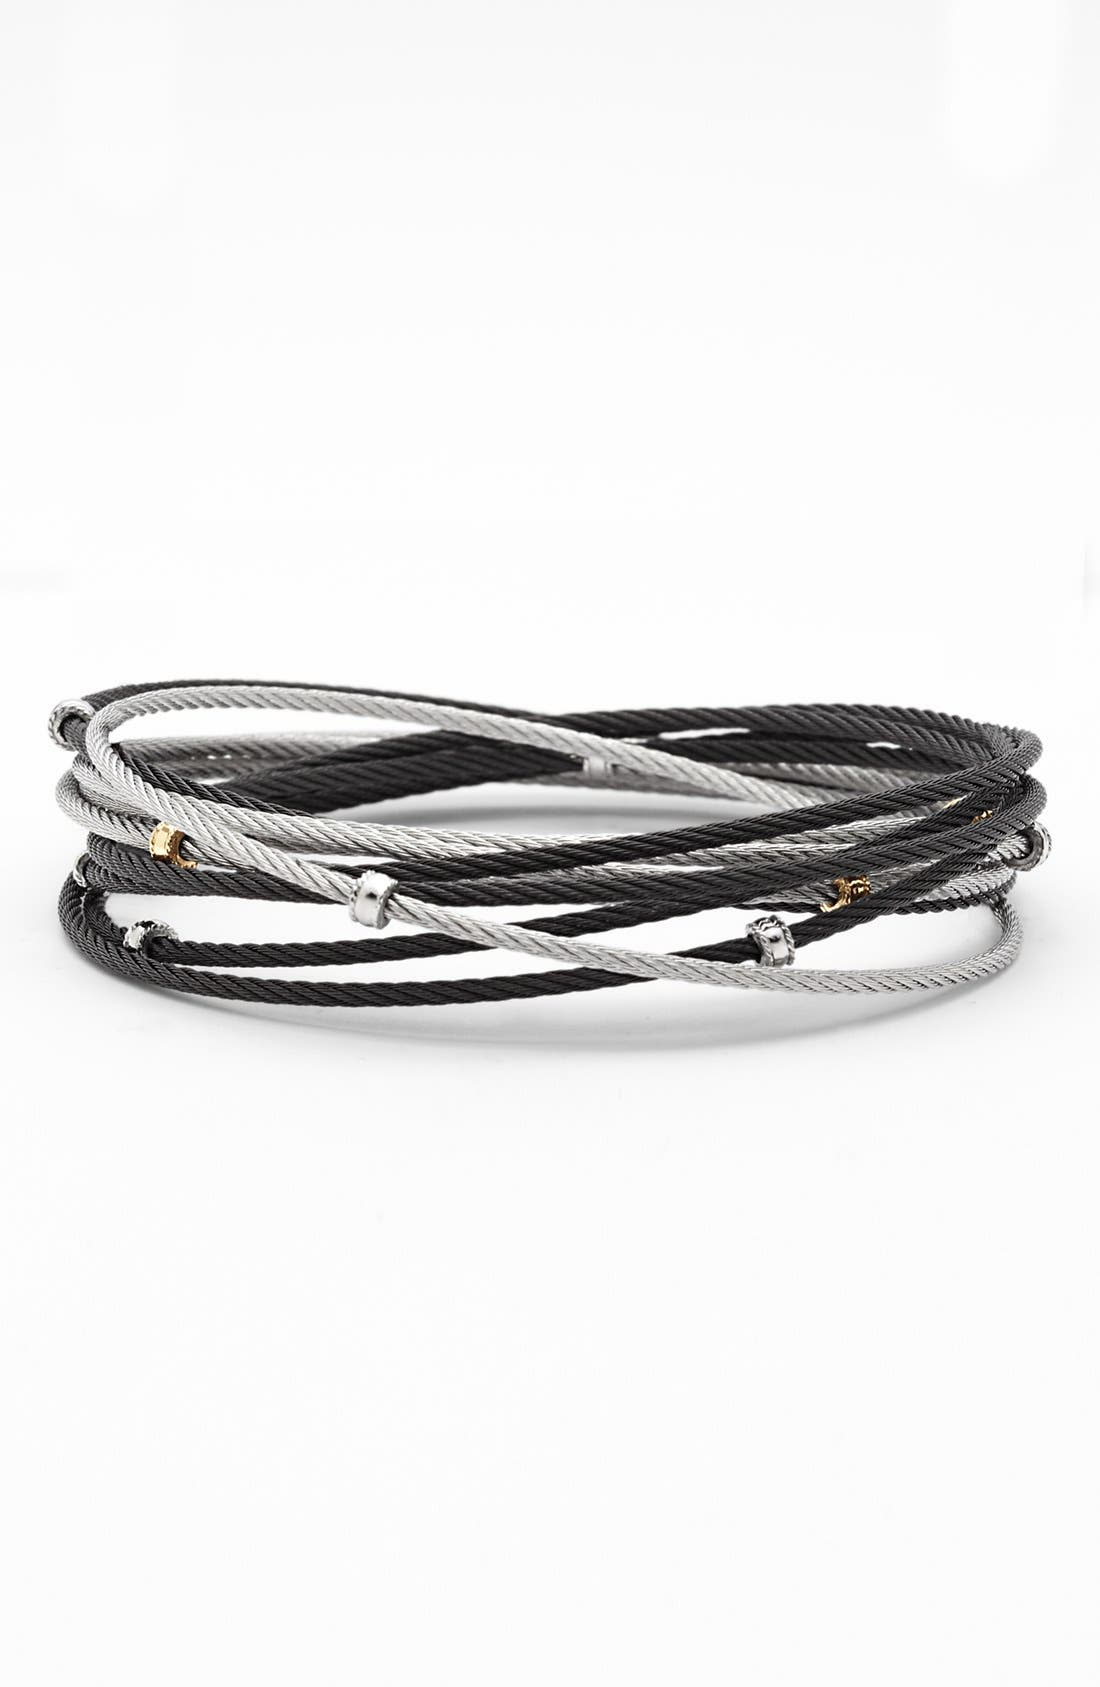 Alternate Image 1 Selected - ALOR® Interlocked Cable Bracelet Set